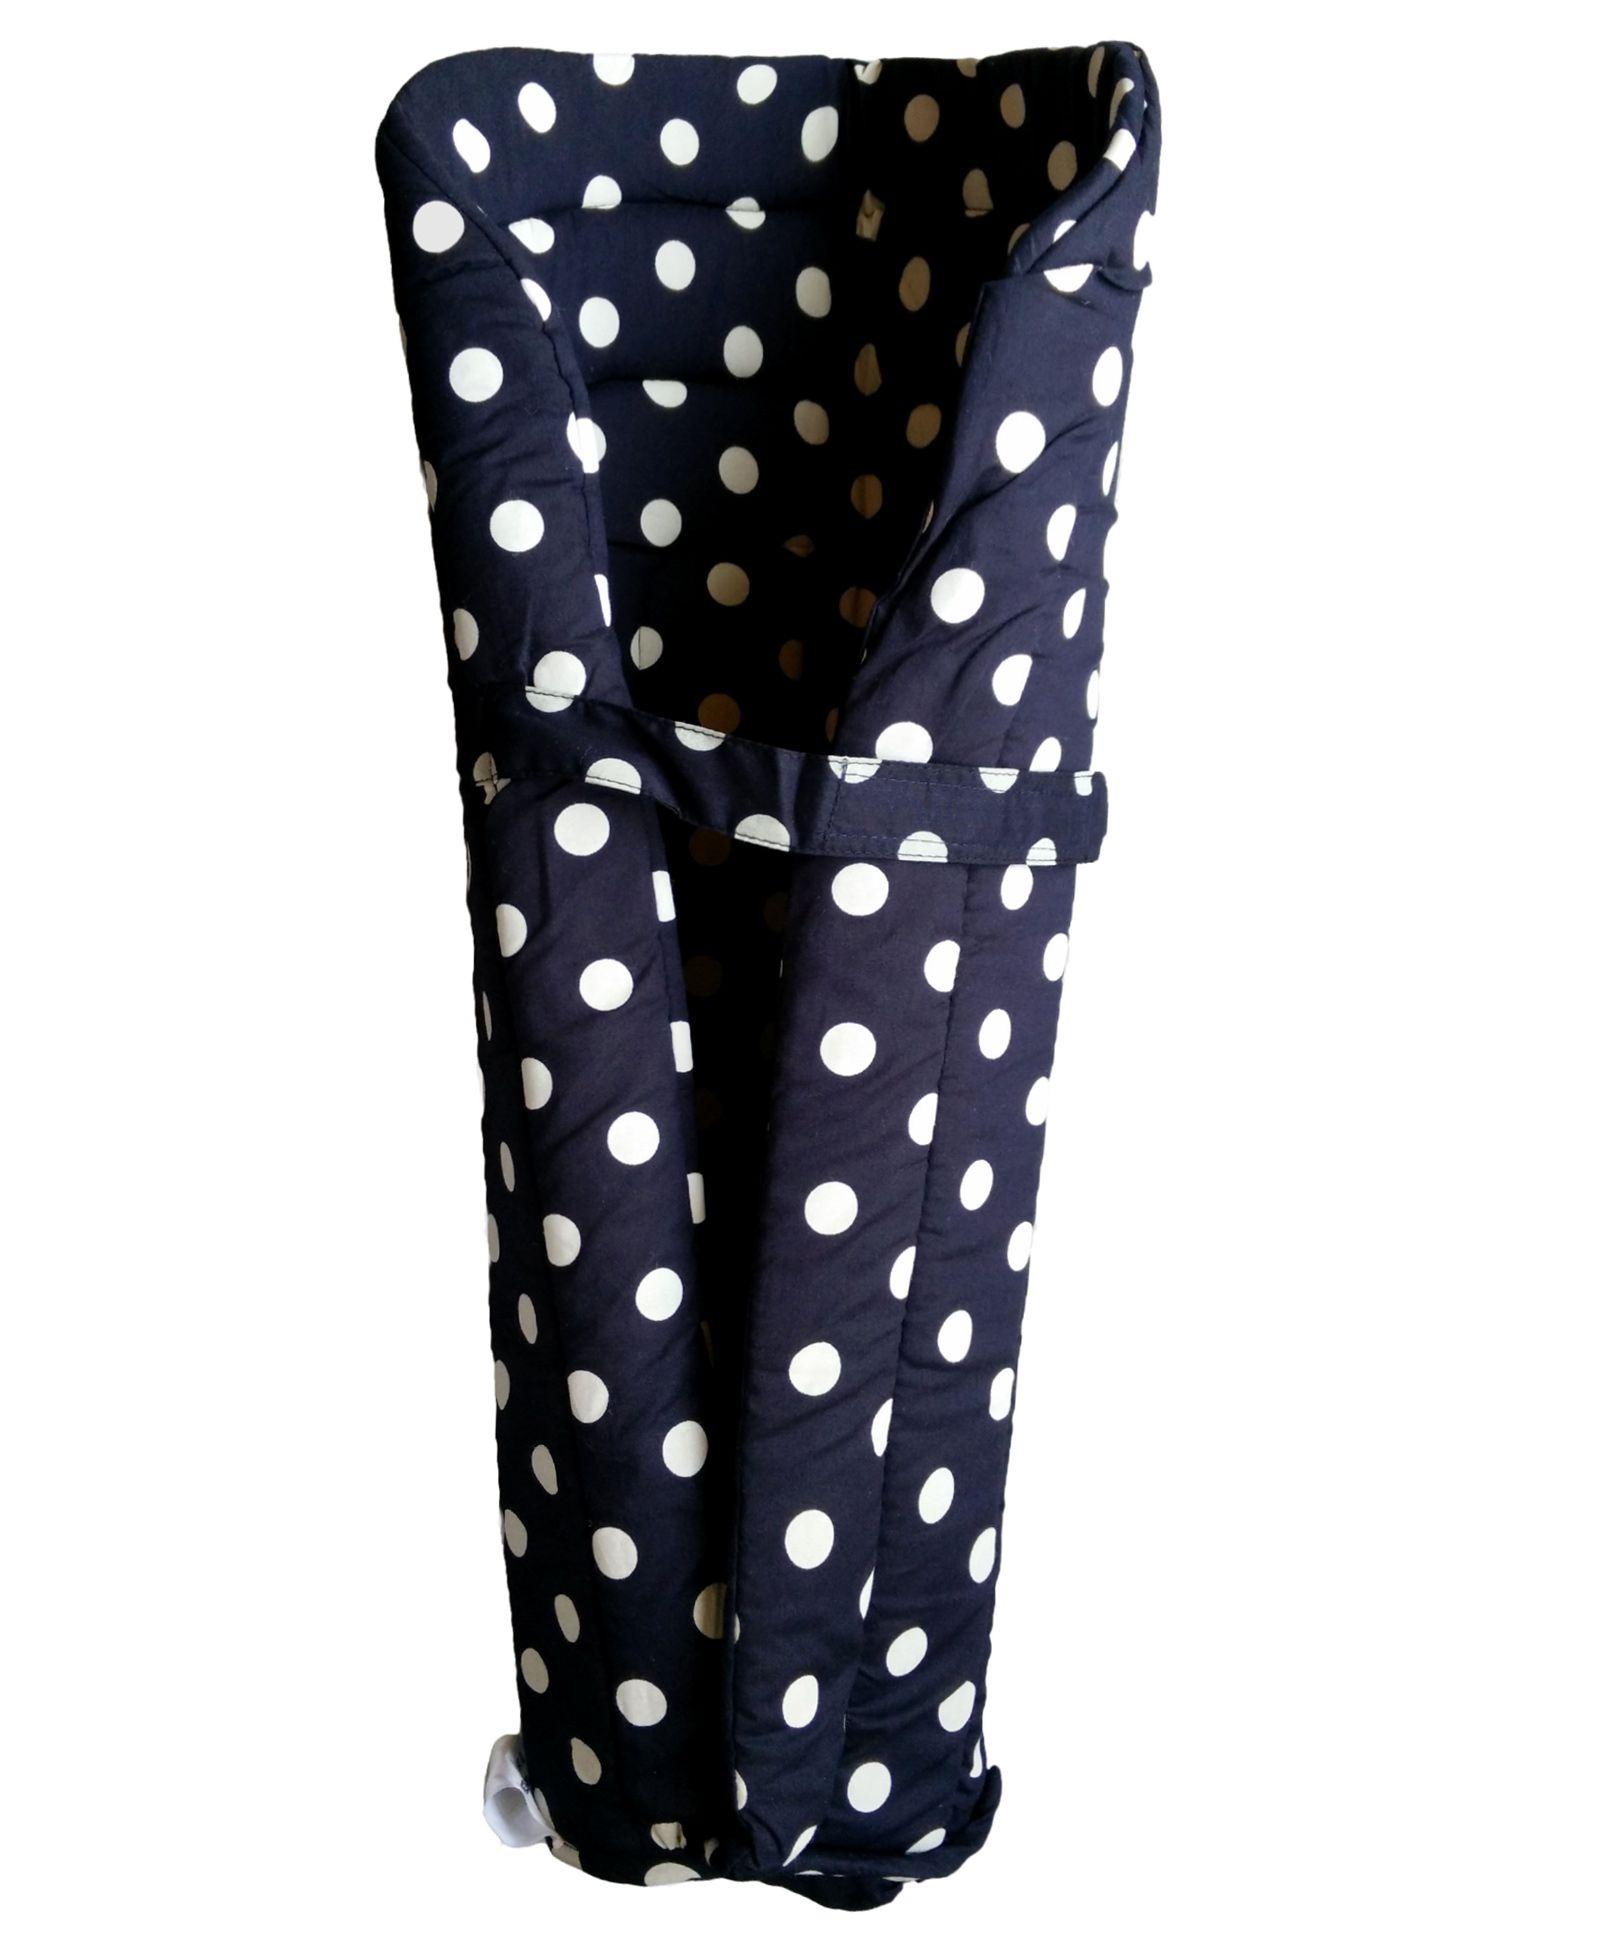 Grandma's Baby Carrier Insert Polka Dots - Black